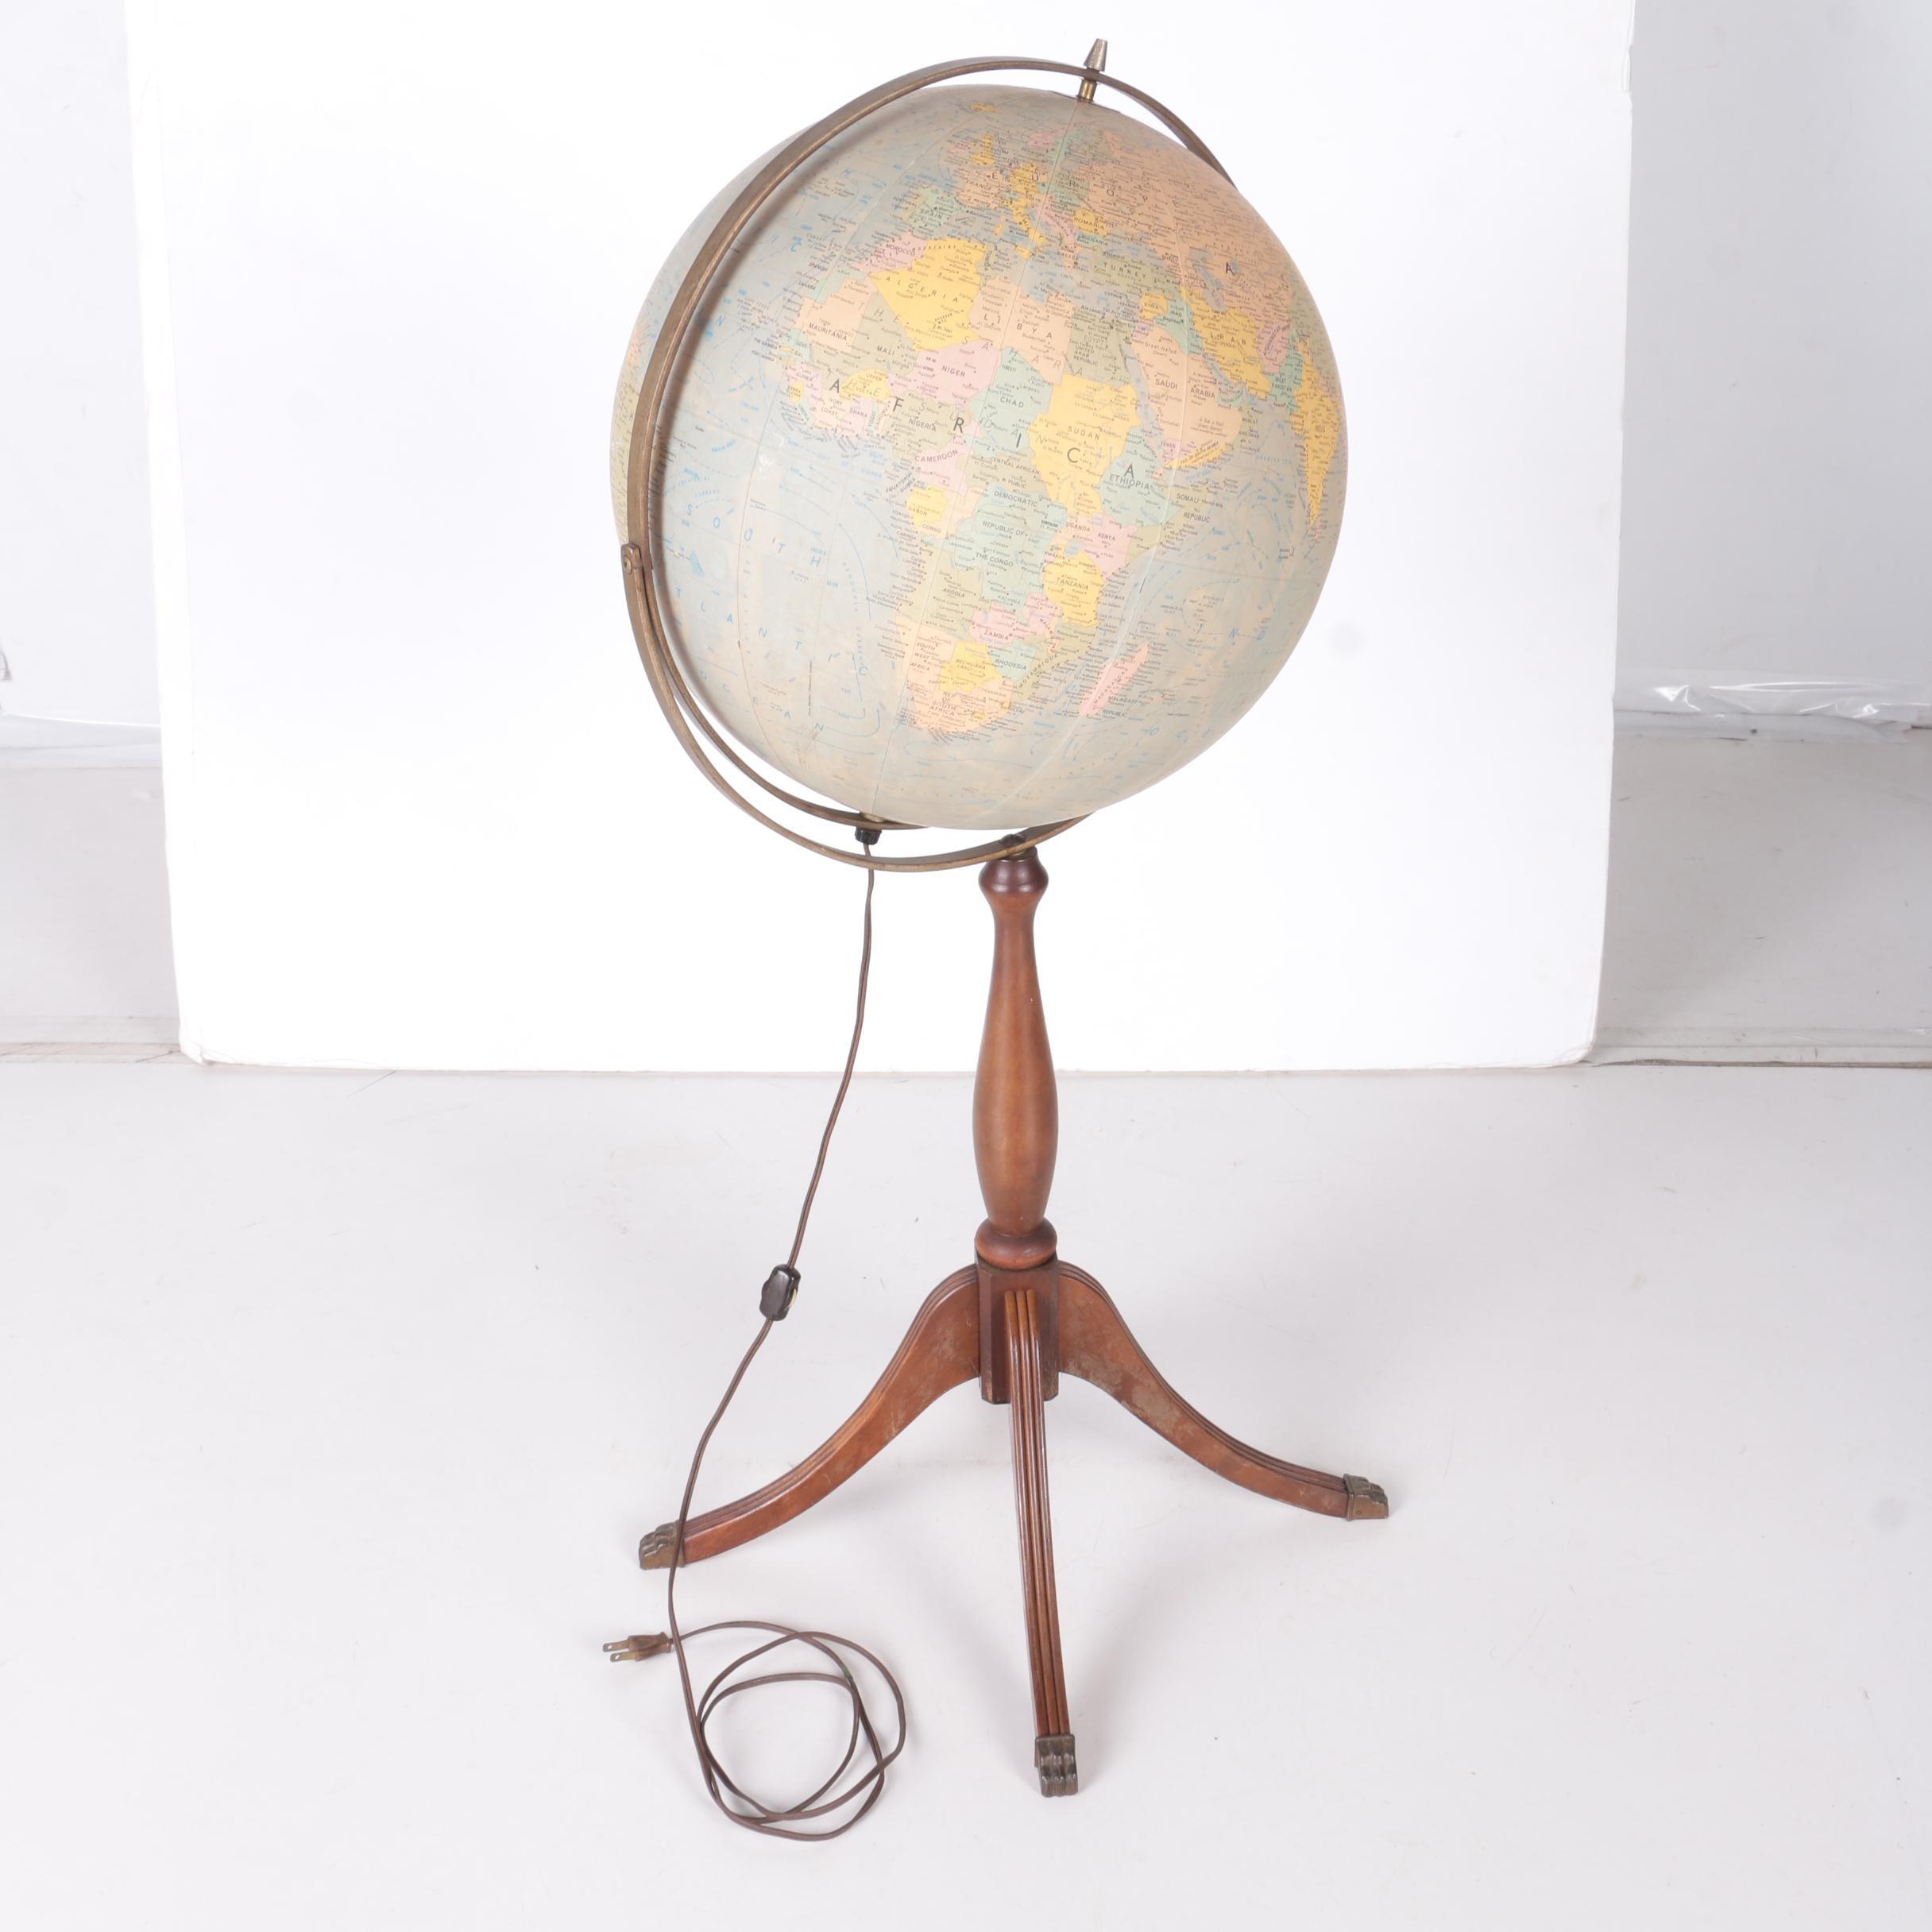 Replogle Light Up World Globe on Wooden Stand